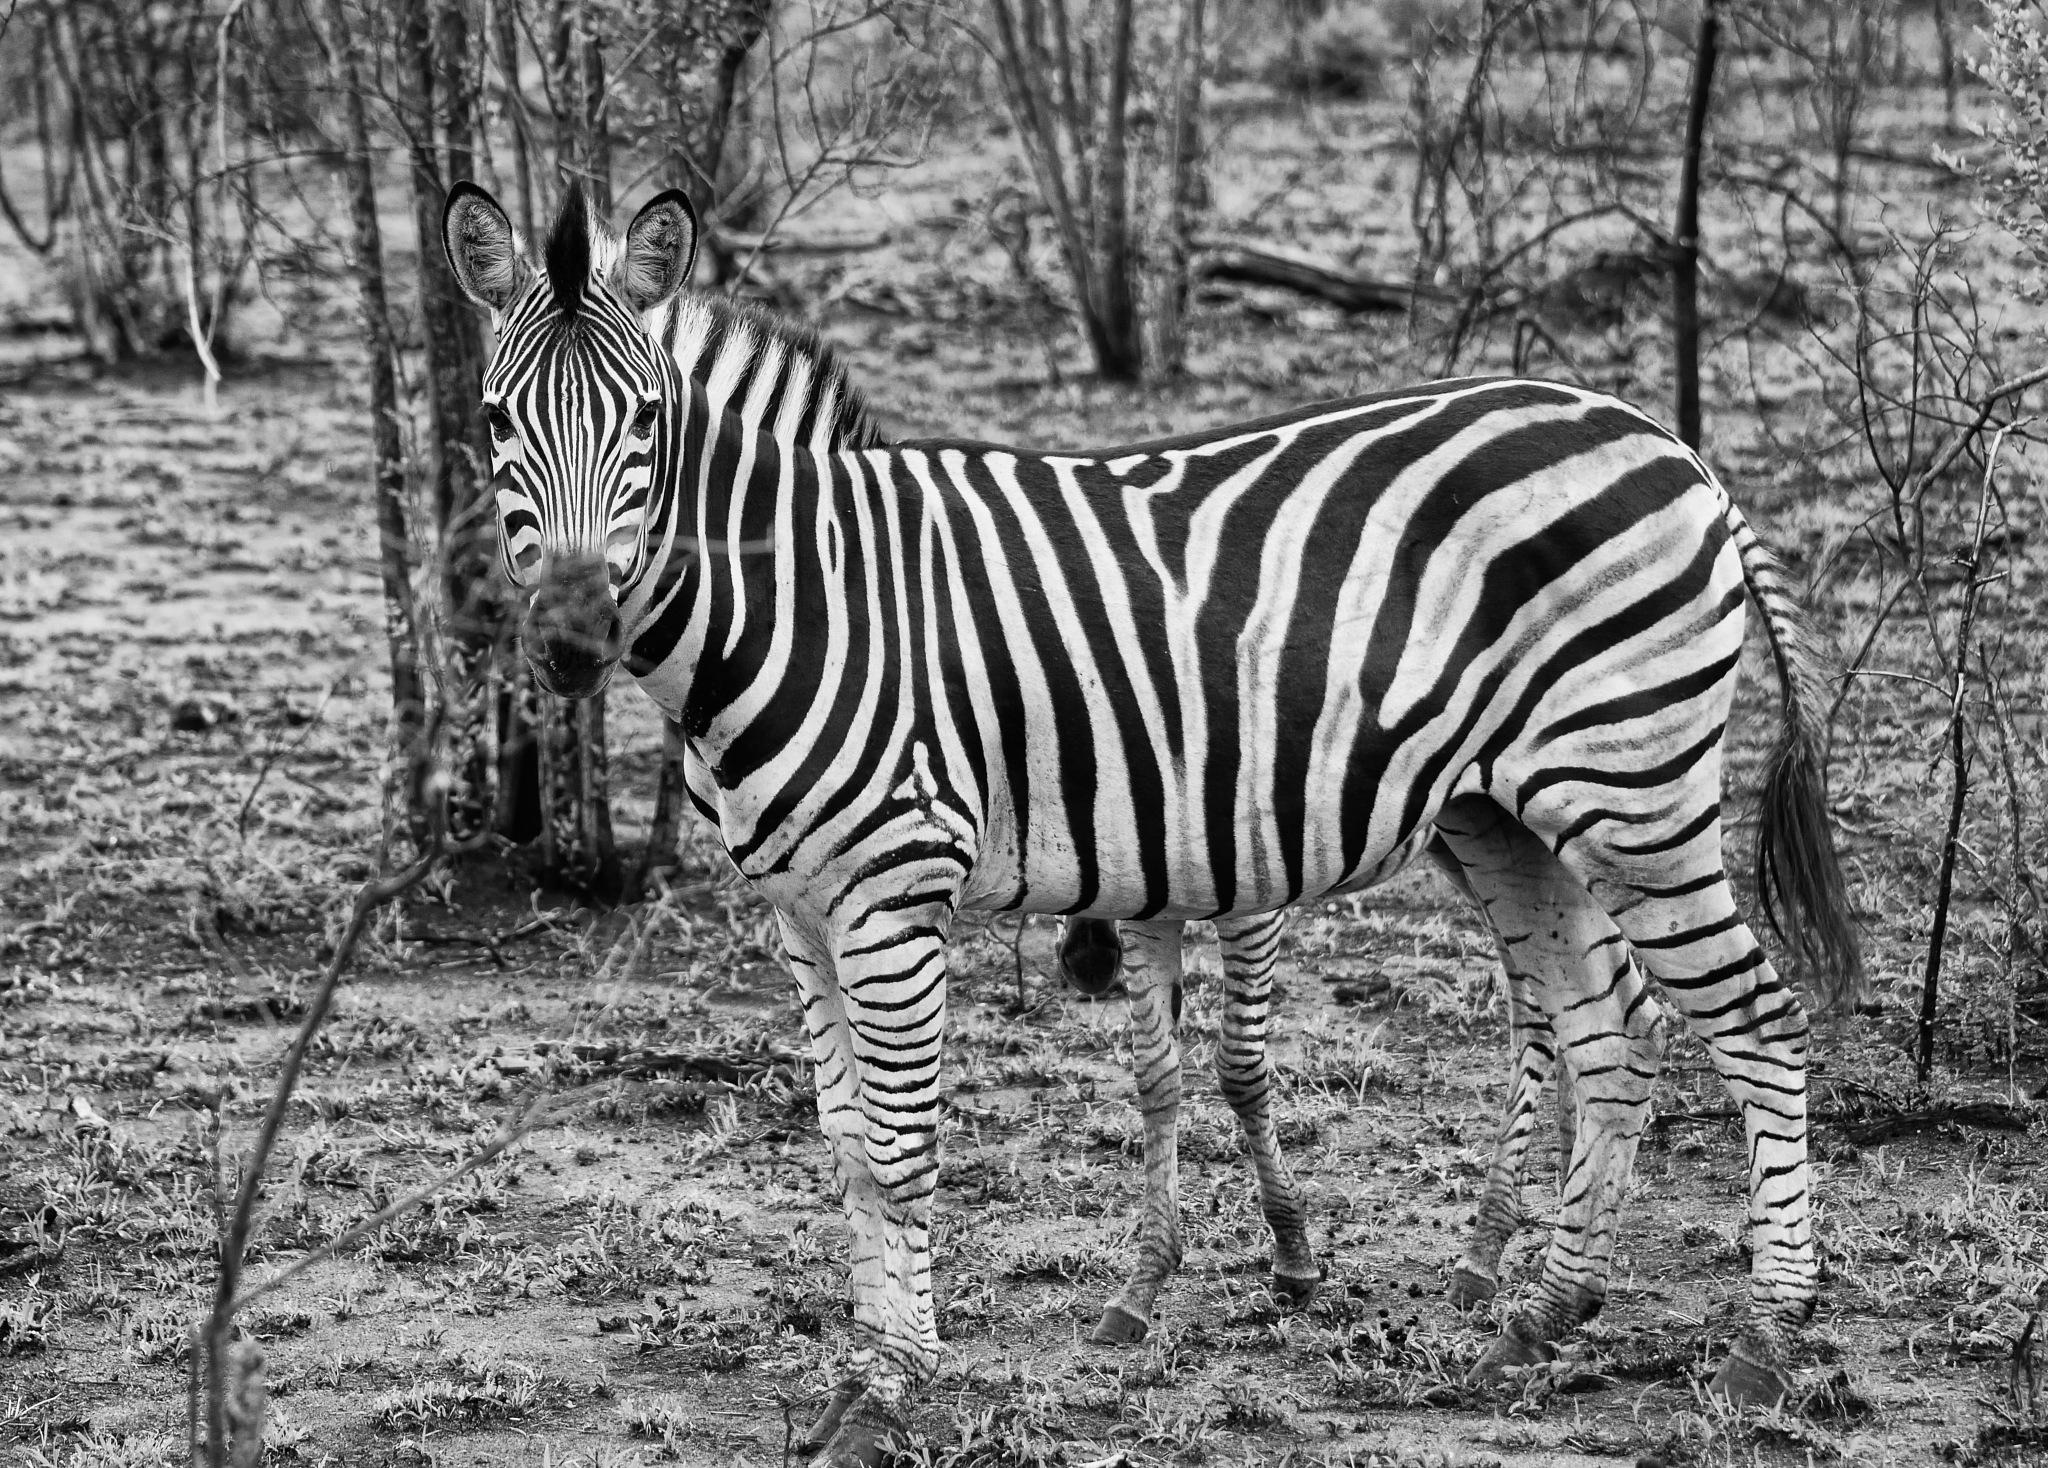 South Africa - Kruger Park (279) Burchell's Zebra by Derek Clarke